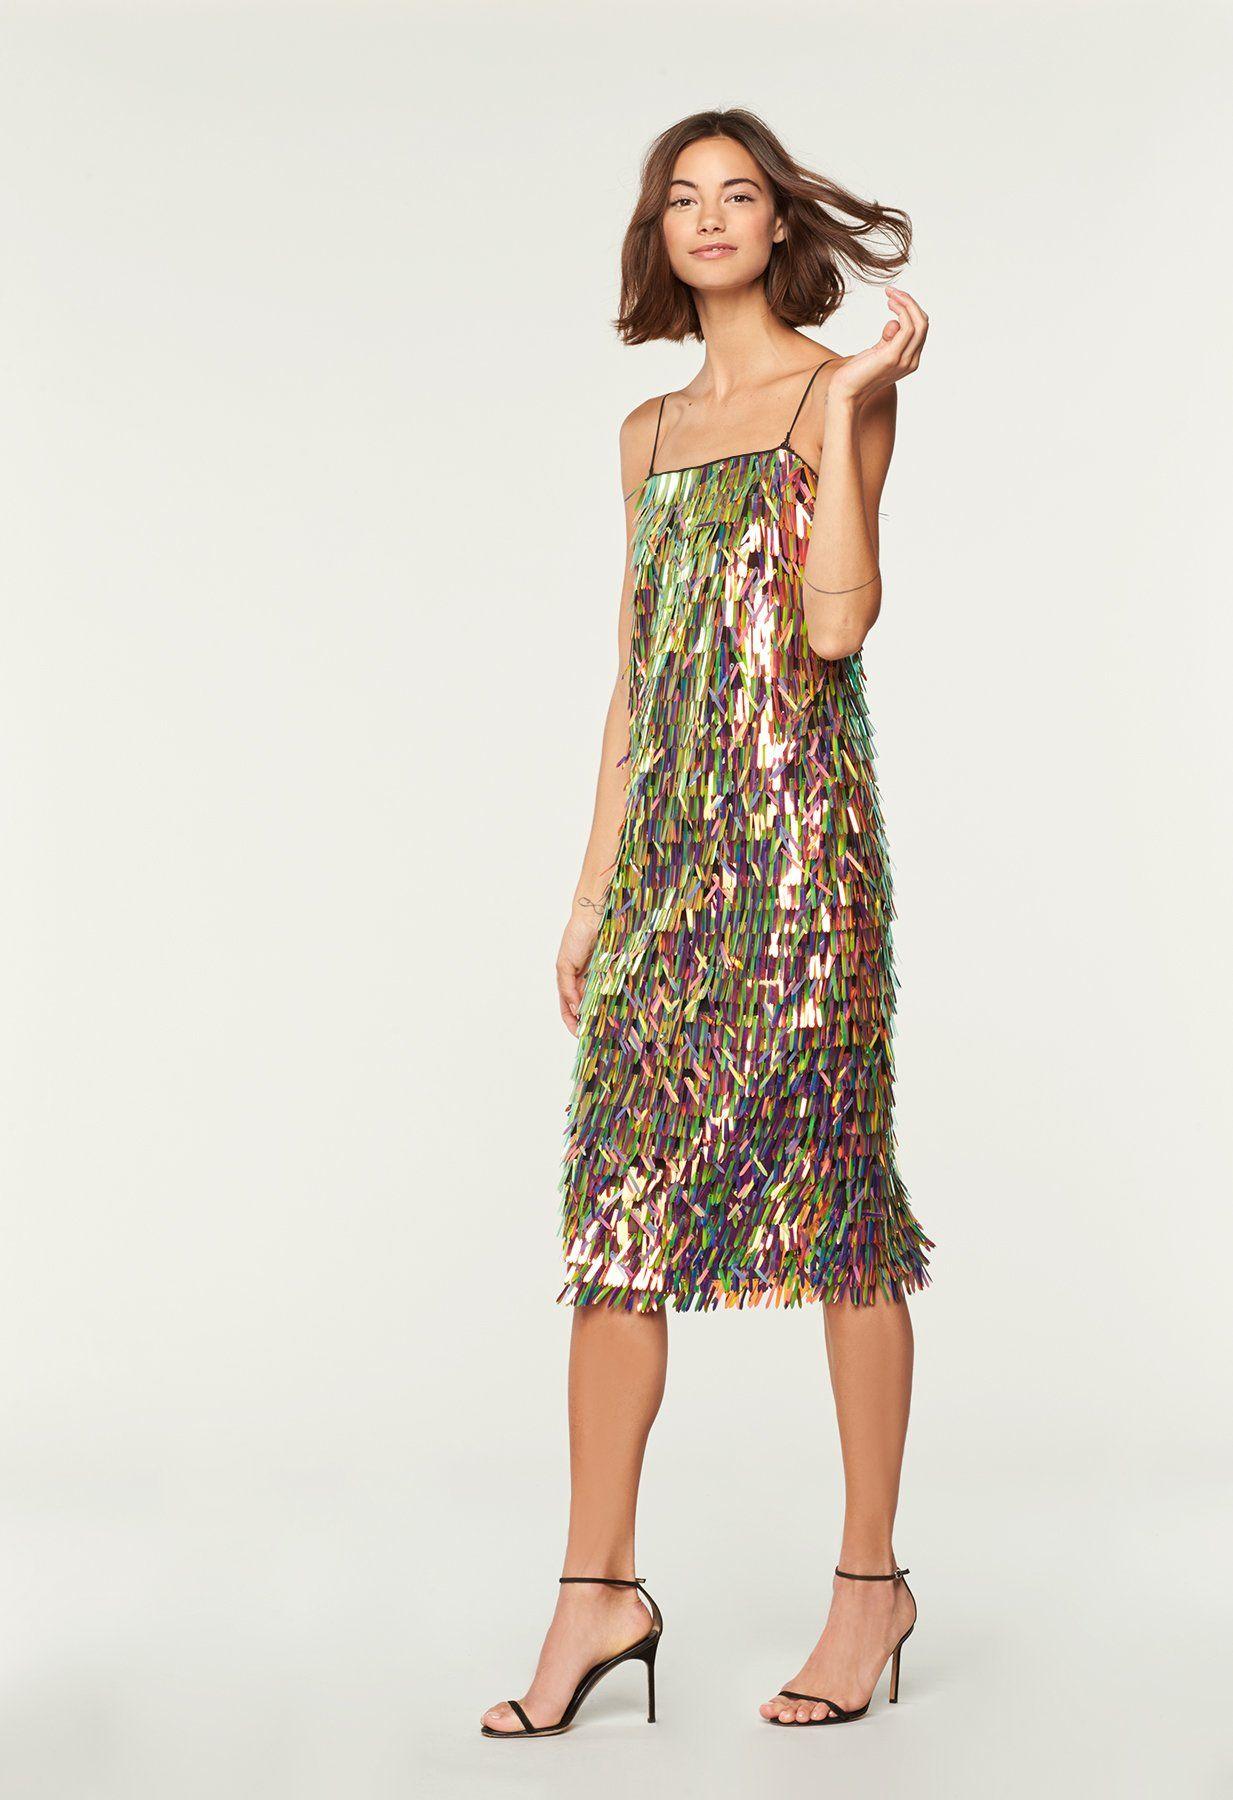 b1306633d Matchstick Paillette Nickie Dress | Dream Closet | Dresses, Fashion ...